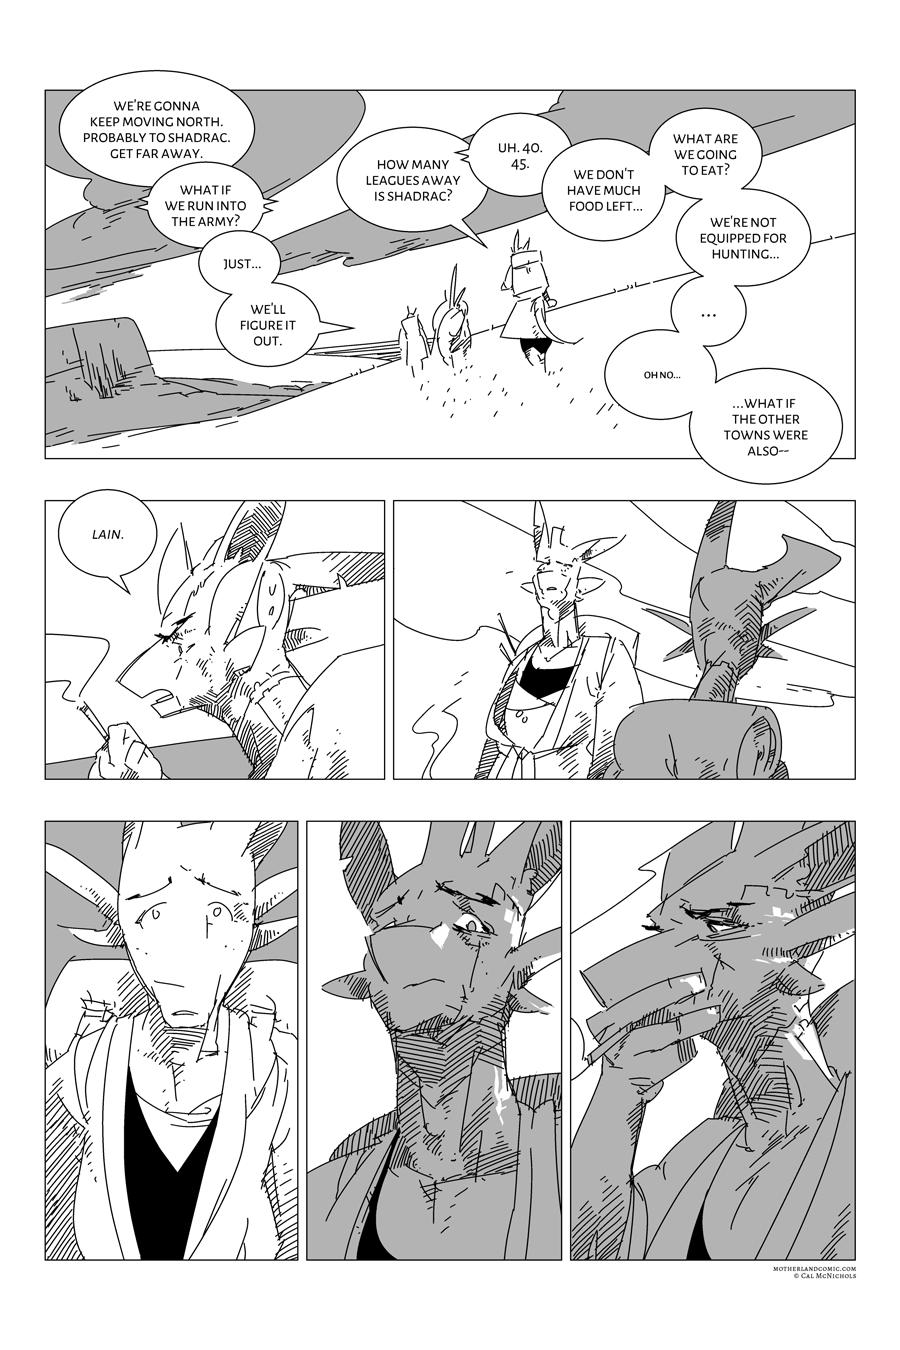 pg 85